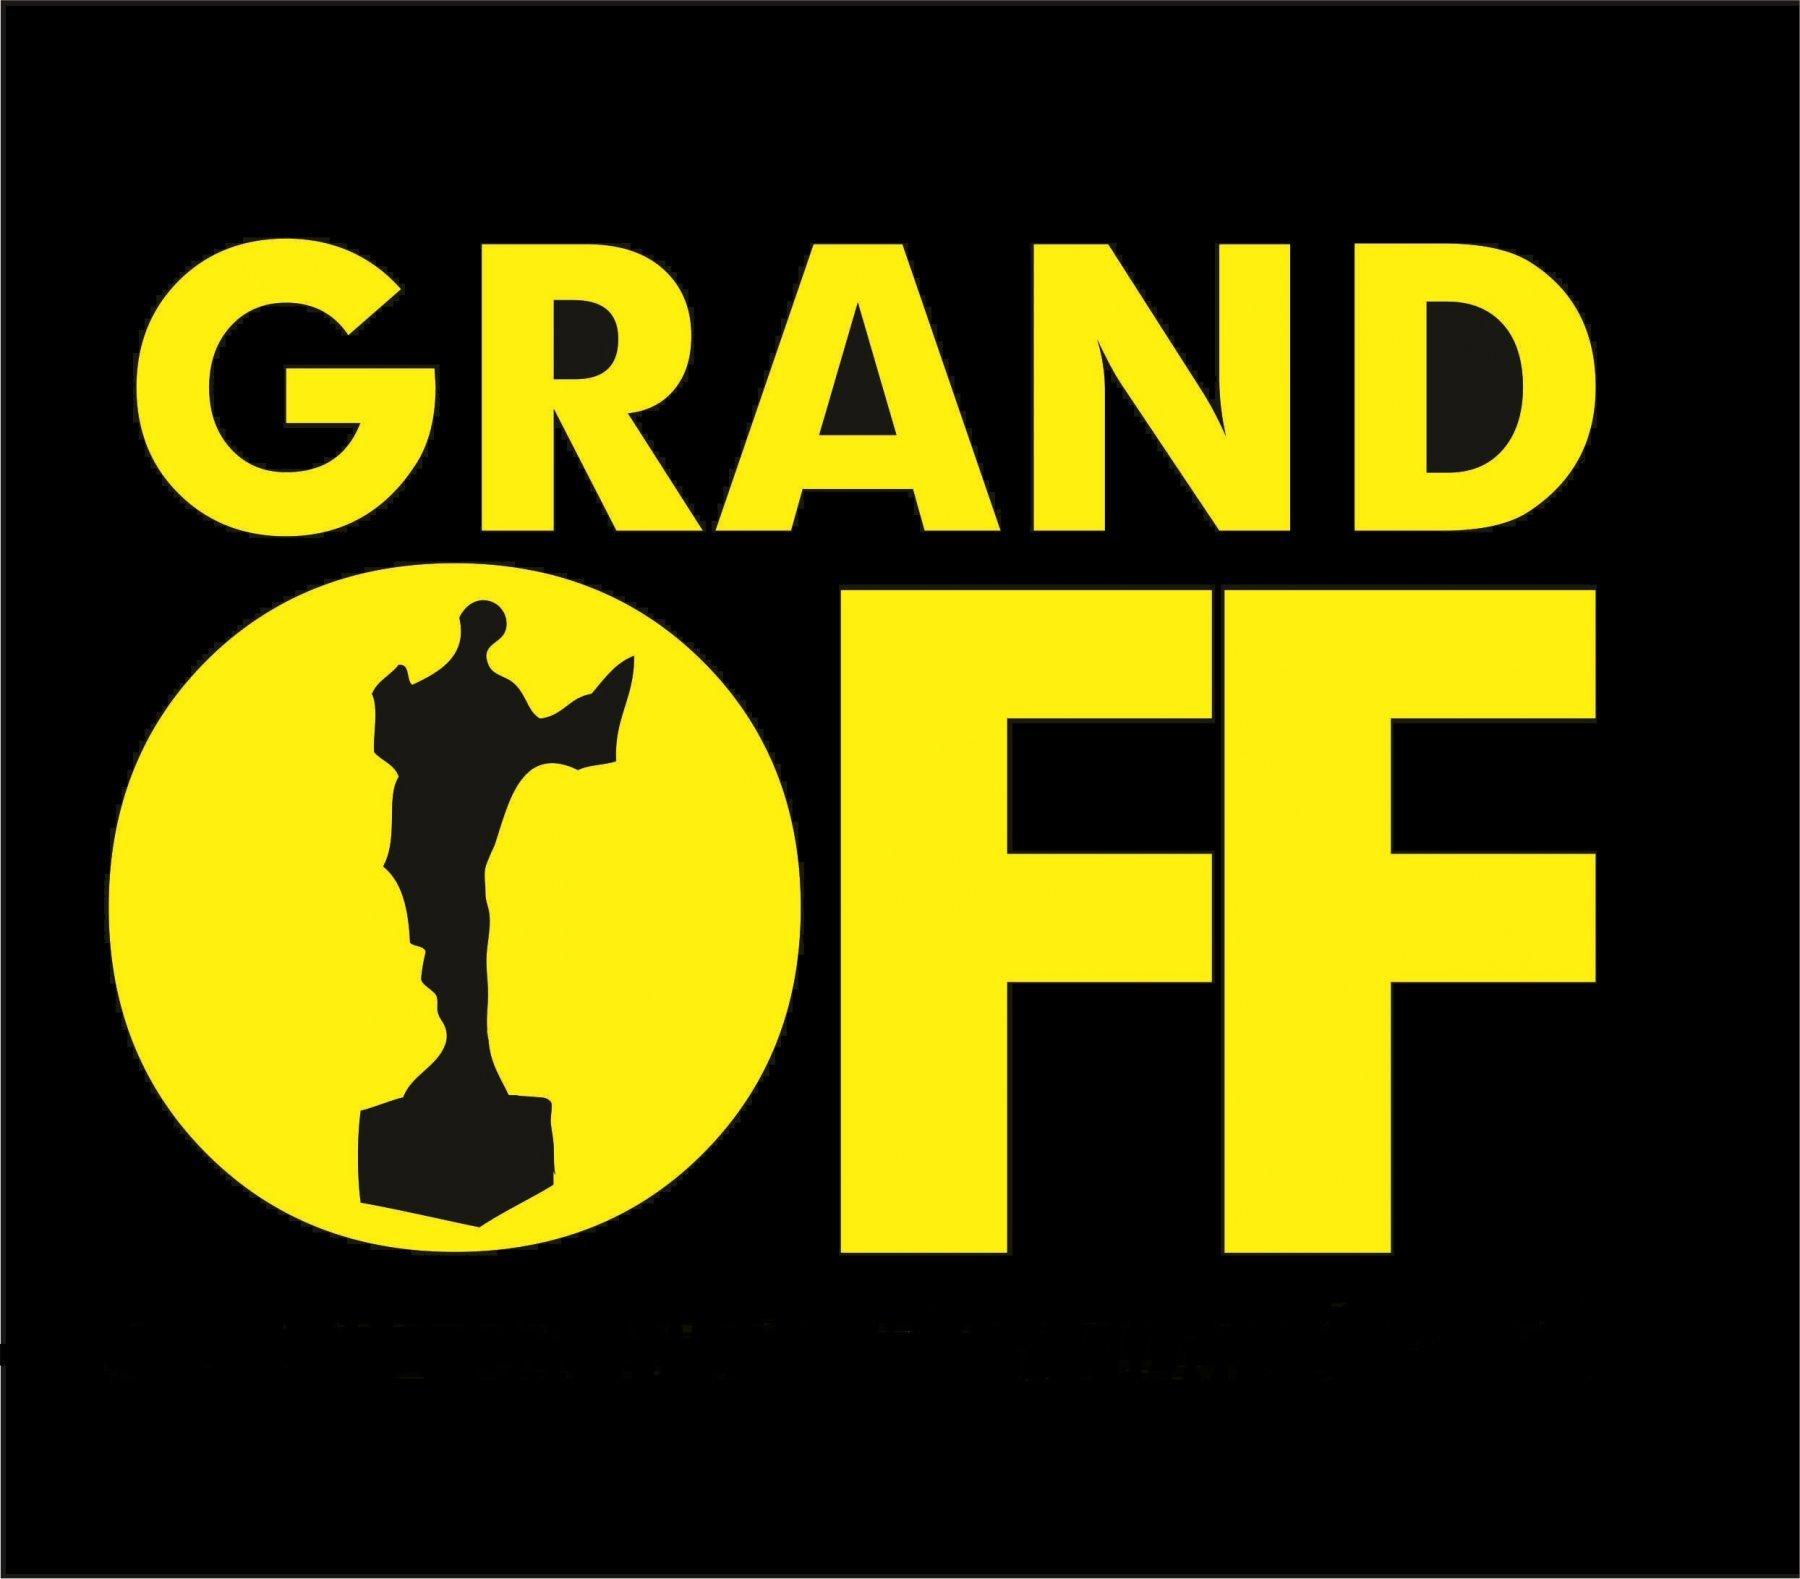 grandoff-pl-logo